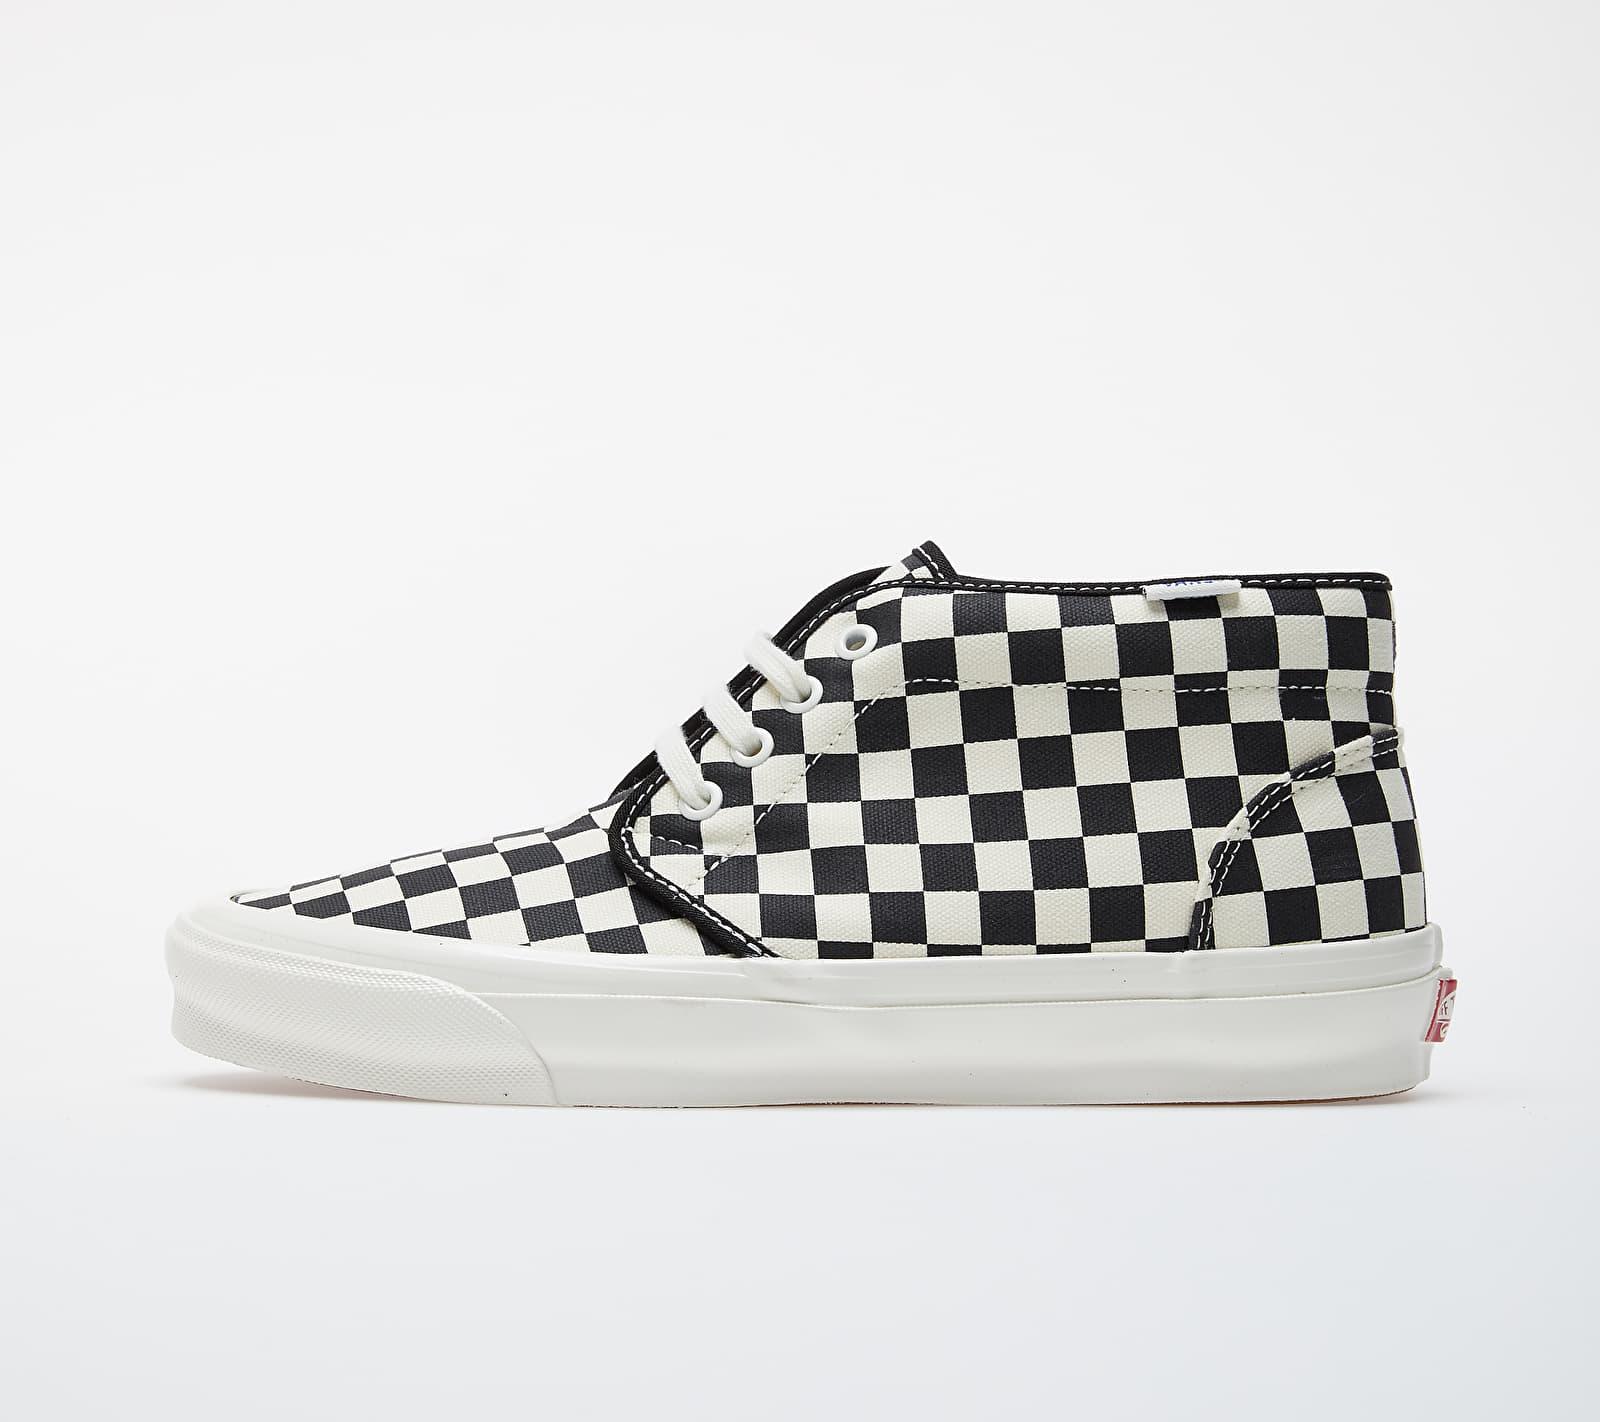 Vans OG Chukka LX (Canvas/ Checkerboard) Black/ White VN0A4U3GXC81